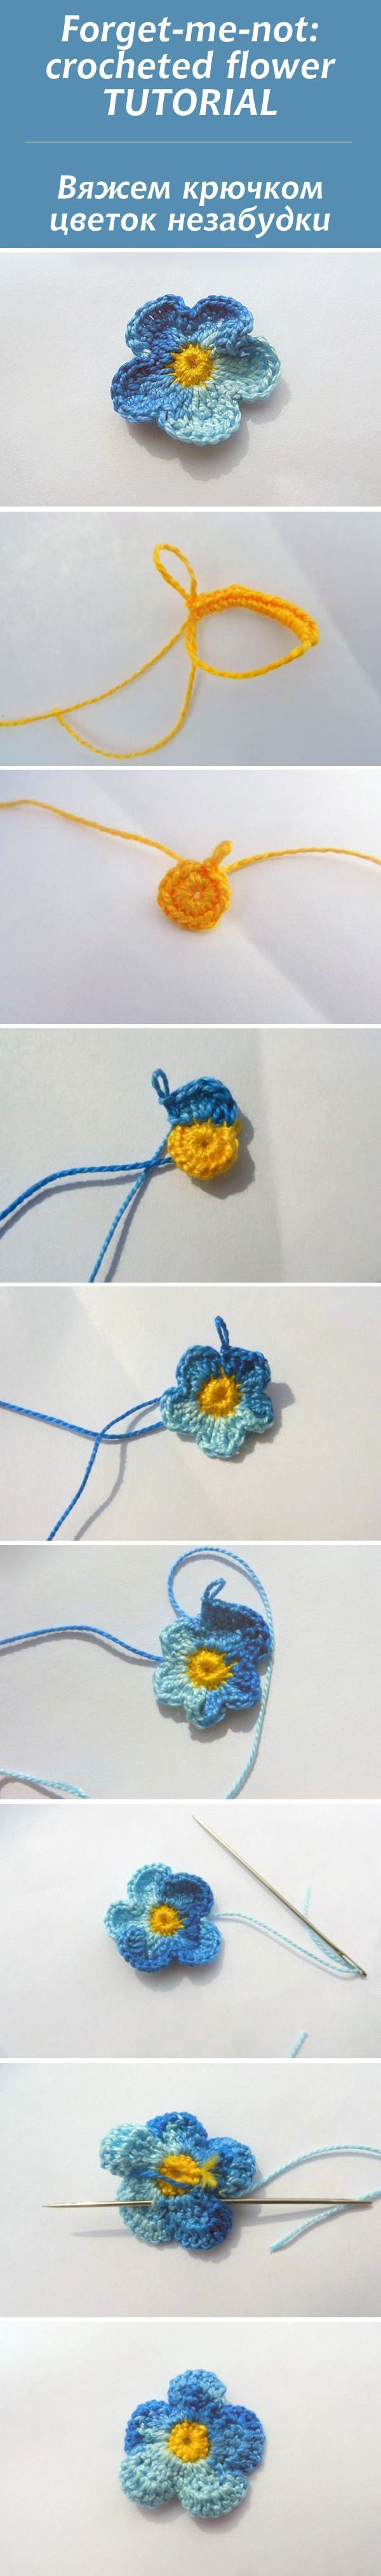 Вяжем крючком цветок незабудки / Forget-me-not: crocheted flower TUTORIAL  #crochet #flower #tutorial